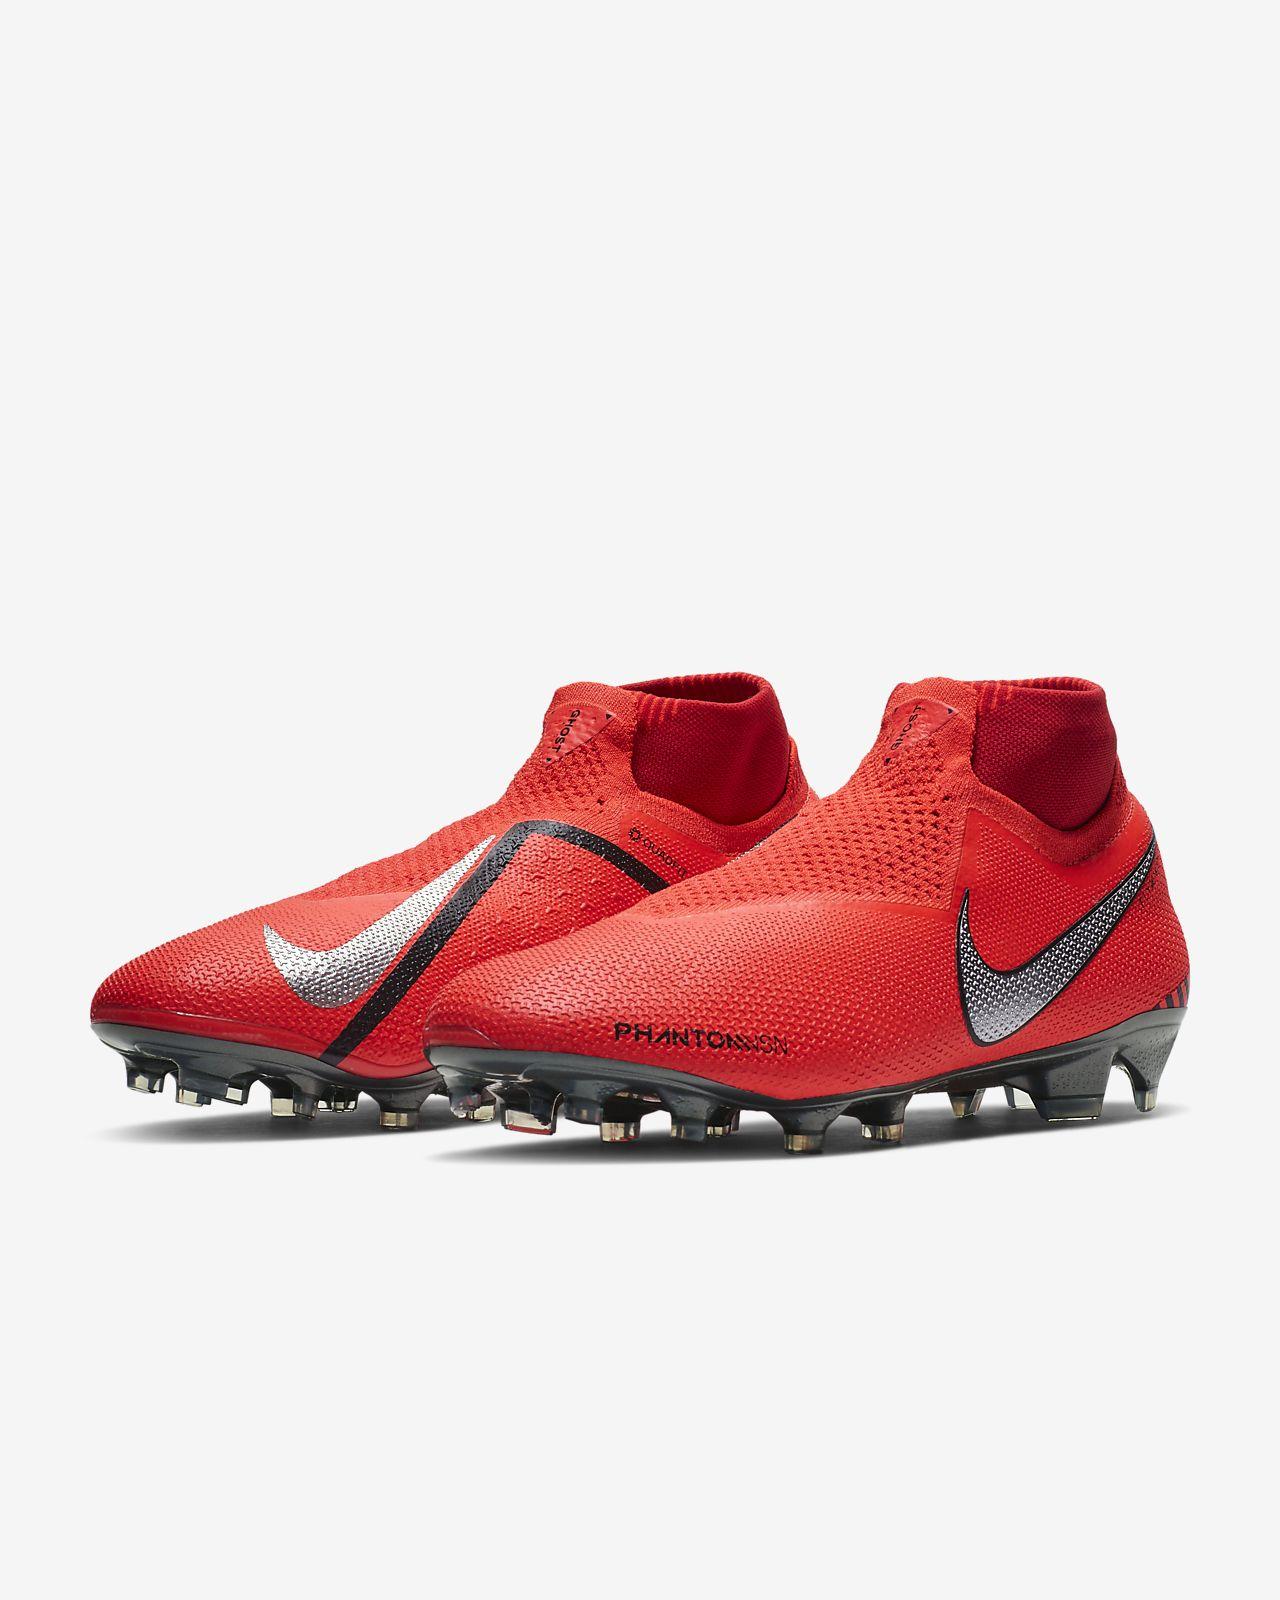 ac40b815f646 ... Nike PhantomVSN Elite Dynamic Fit Game Over FG Firm-Ground Football Boot